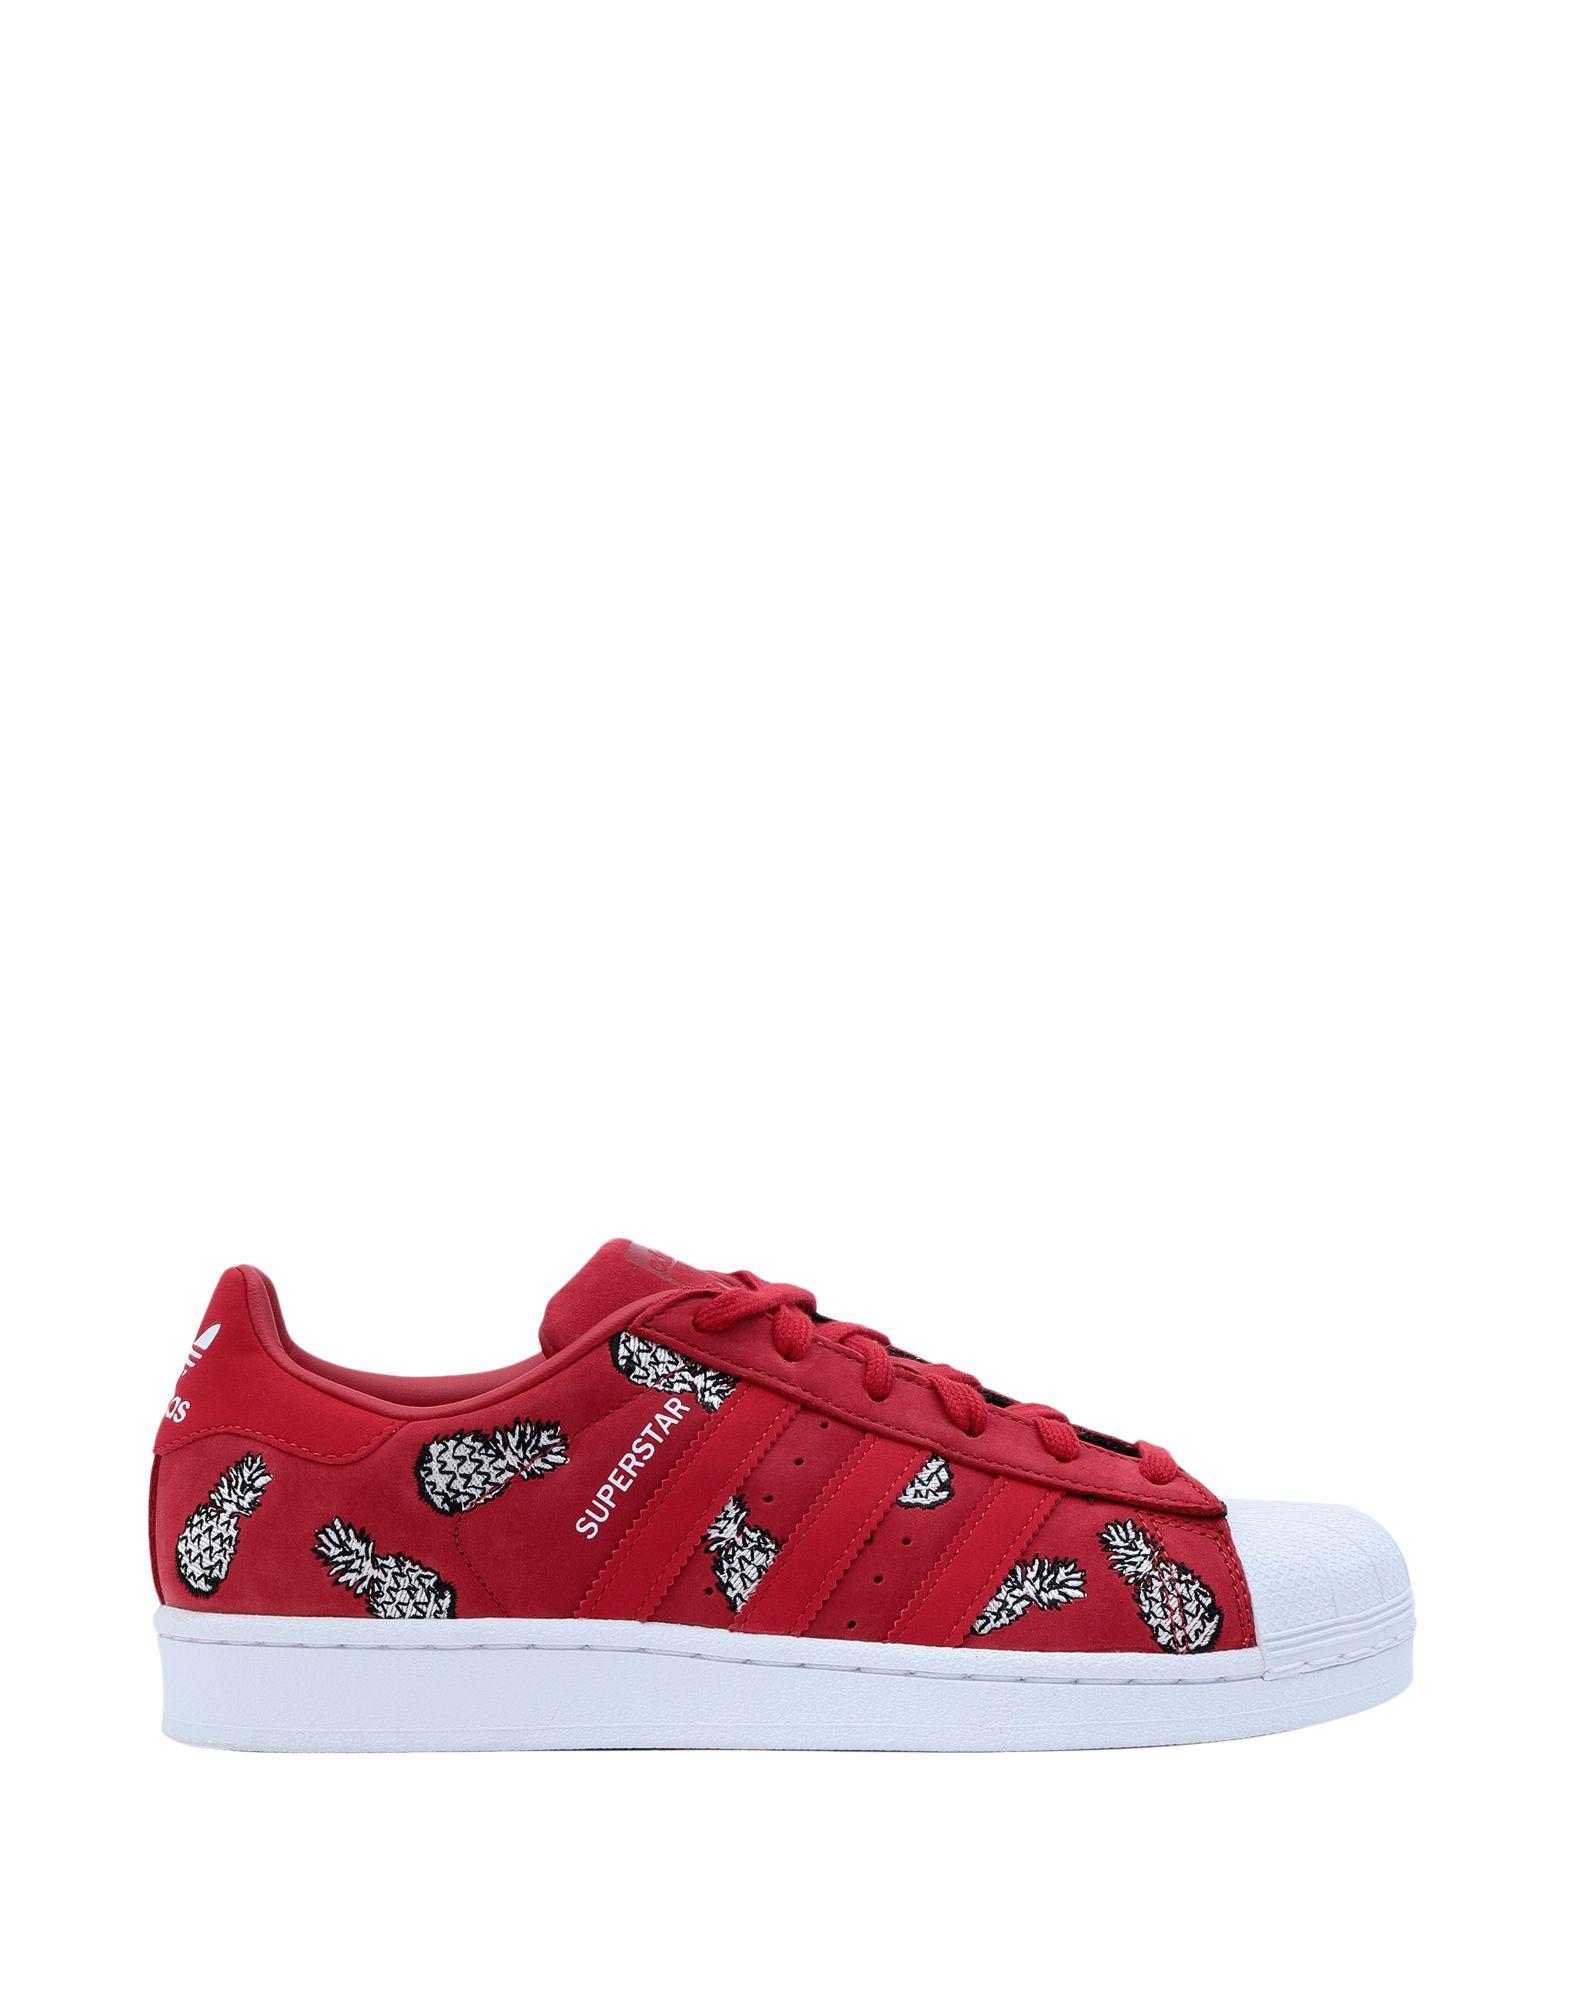 Adidas Originals Superstar W - Sneakers - online Women Adidas Originals Sneakers online - on  Australia - 11570157NT 44bf48